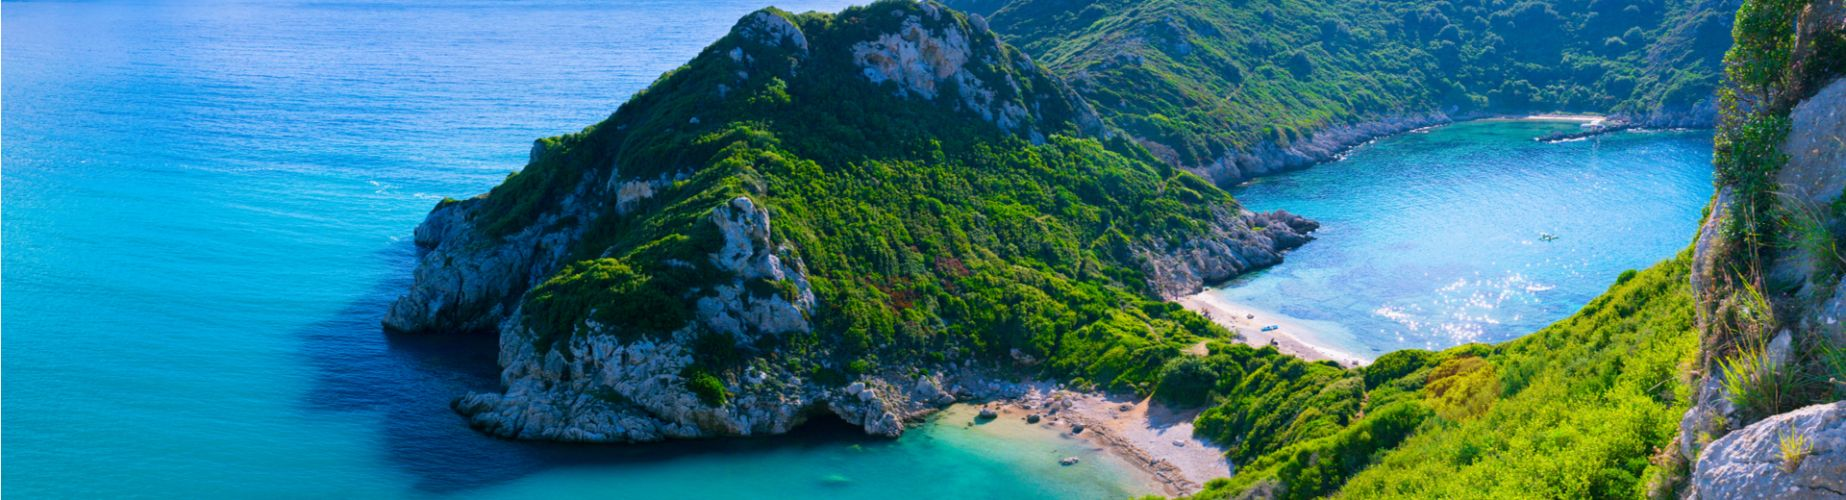 Erlebe 7 Tage Sonne & Strand auf Korfu